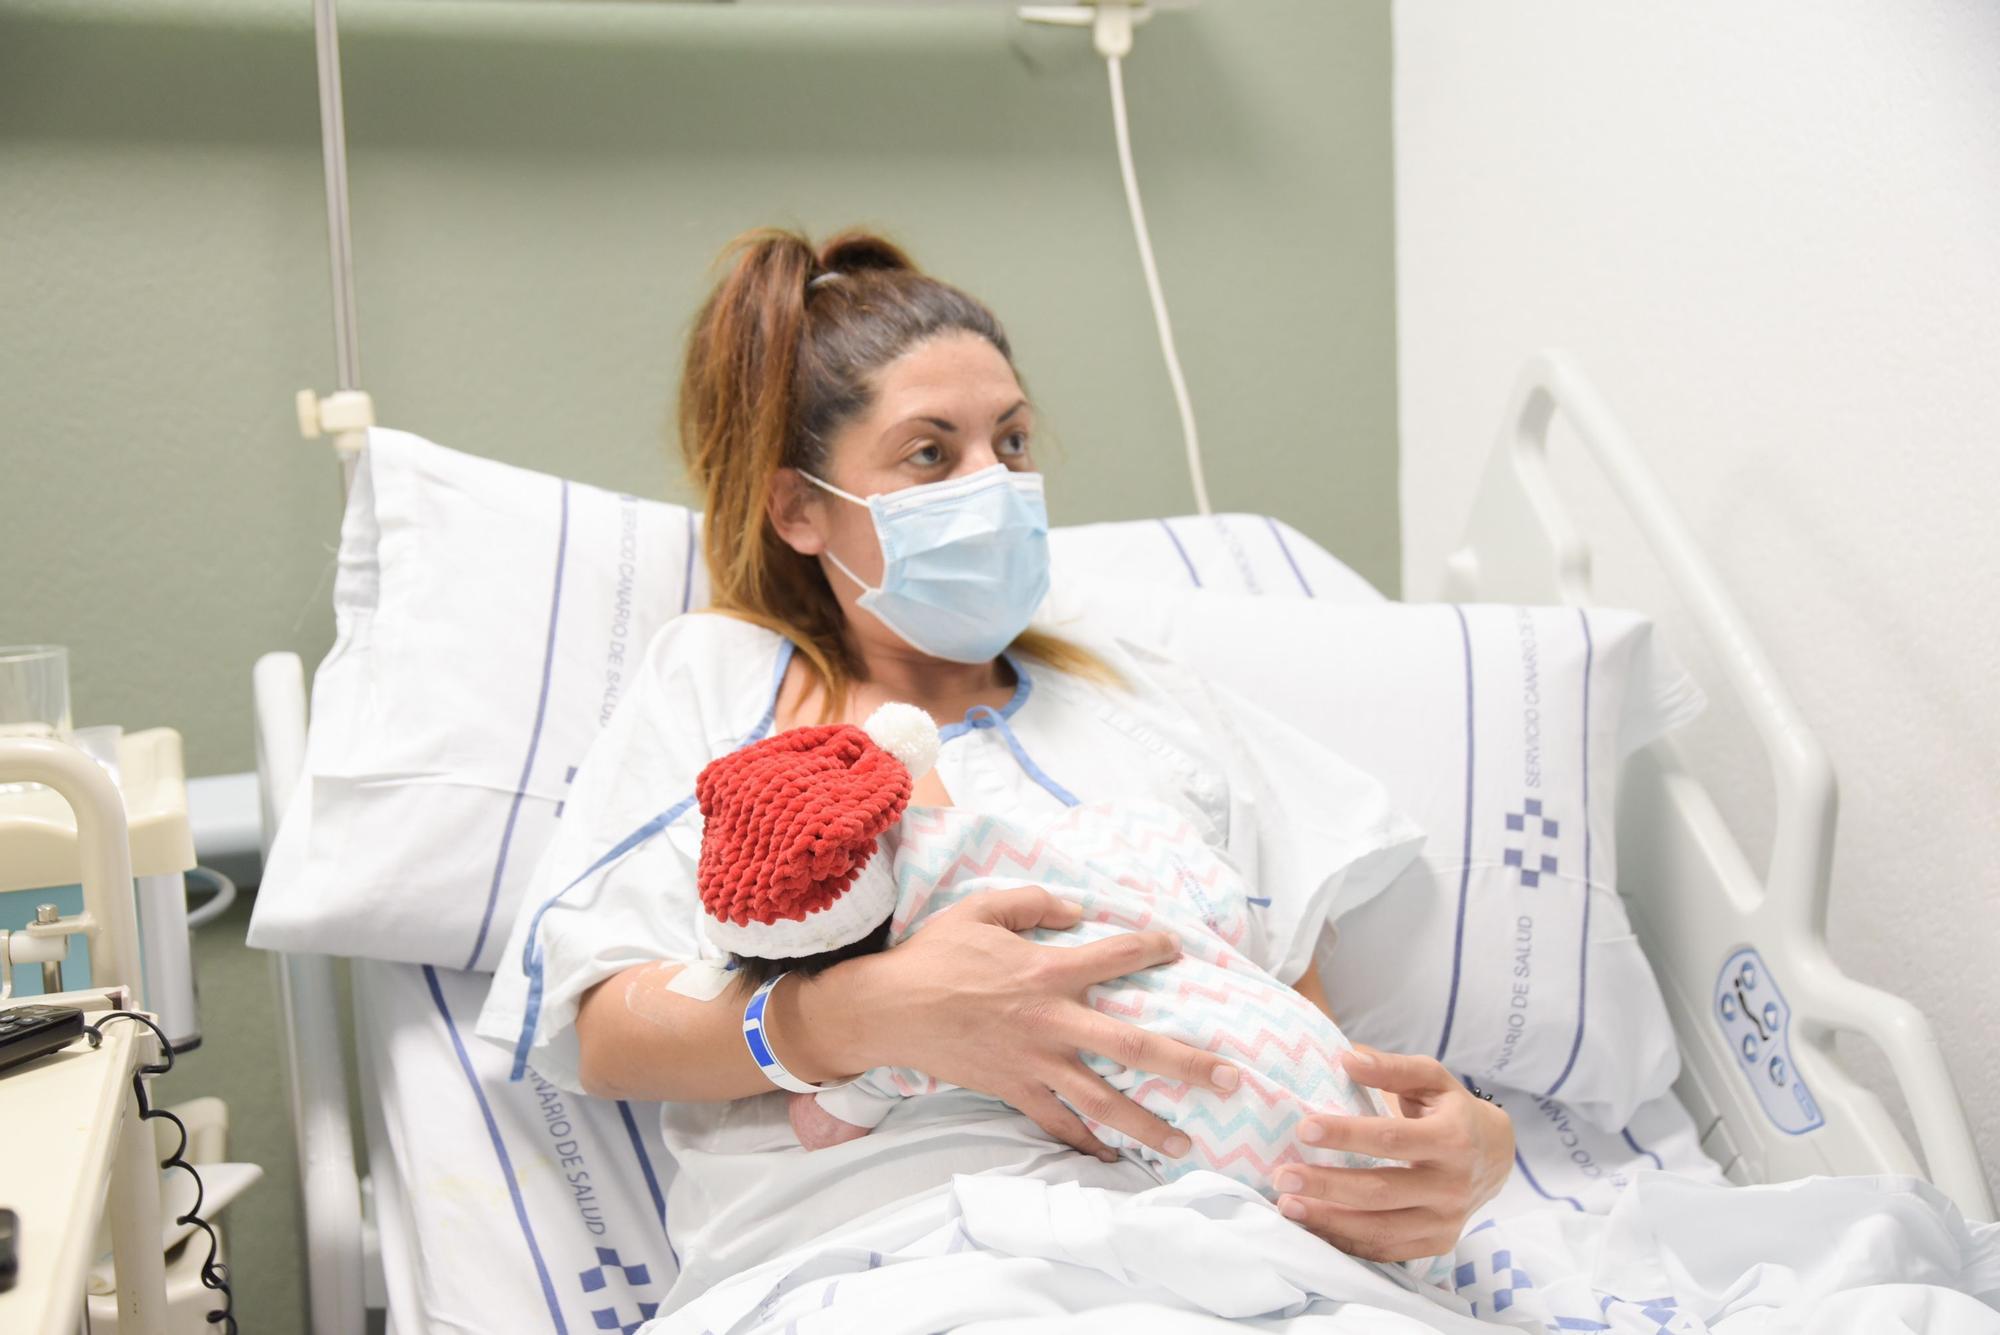 Sara, first baby born in Tenerife in 2021